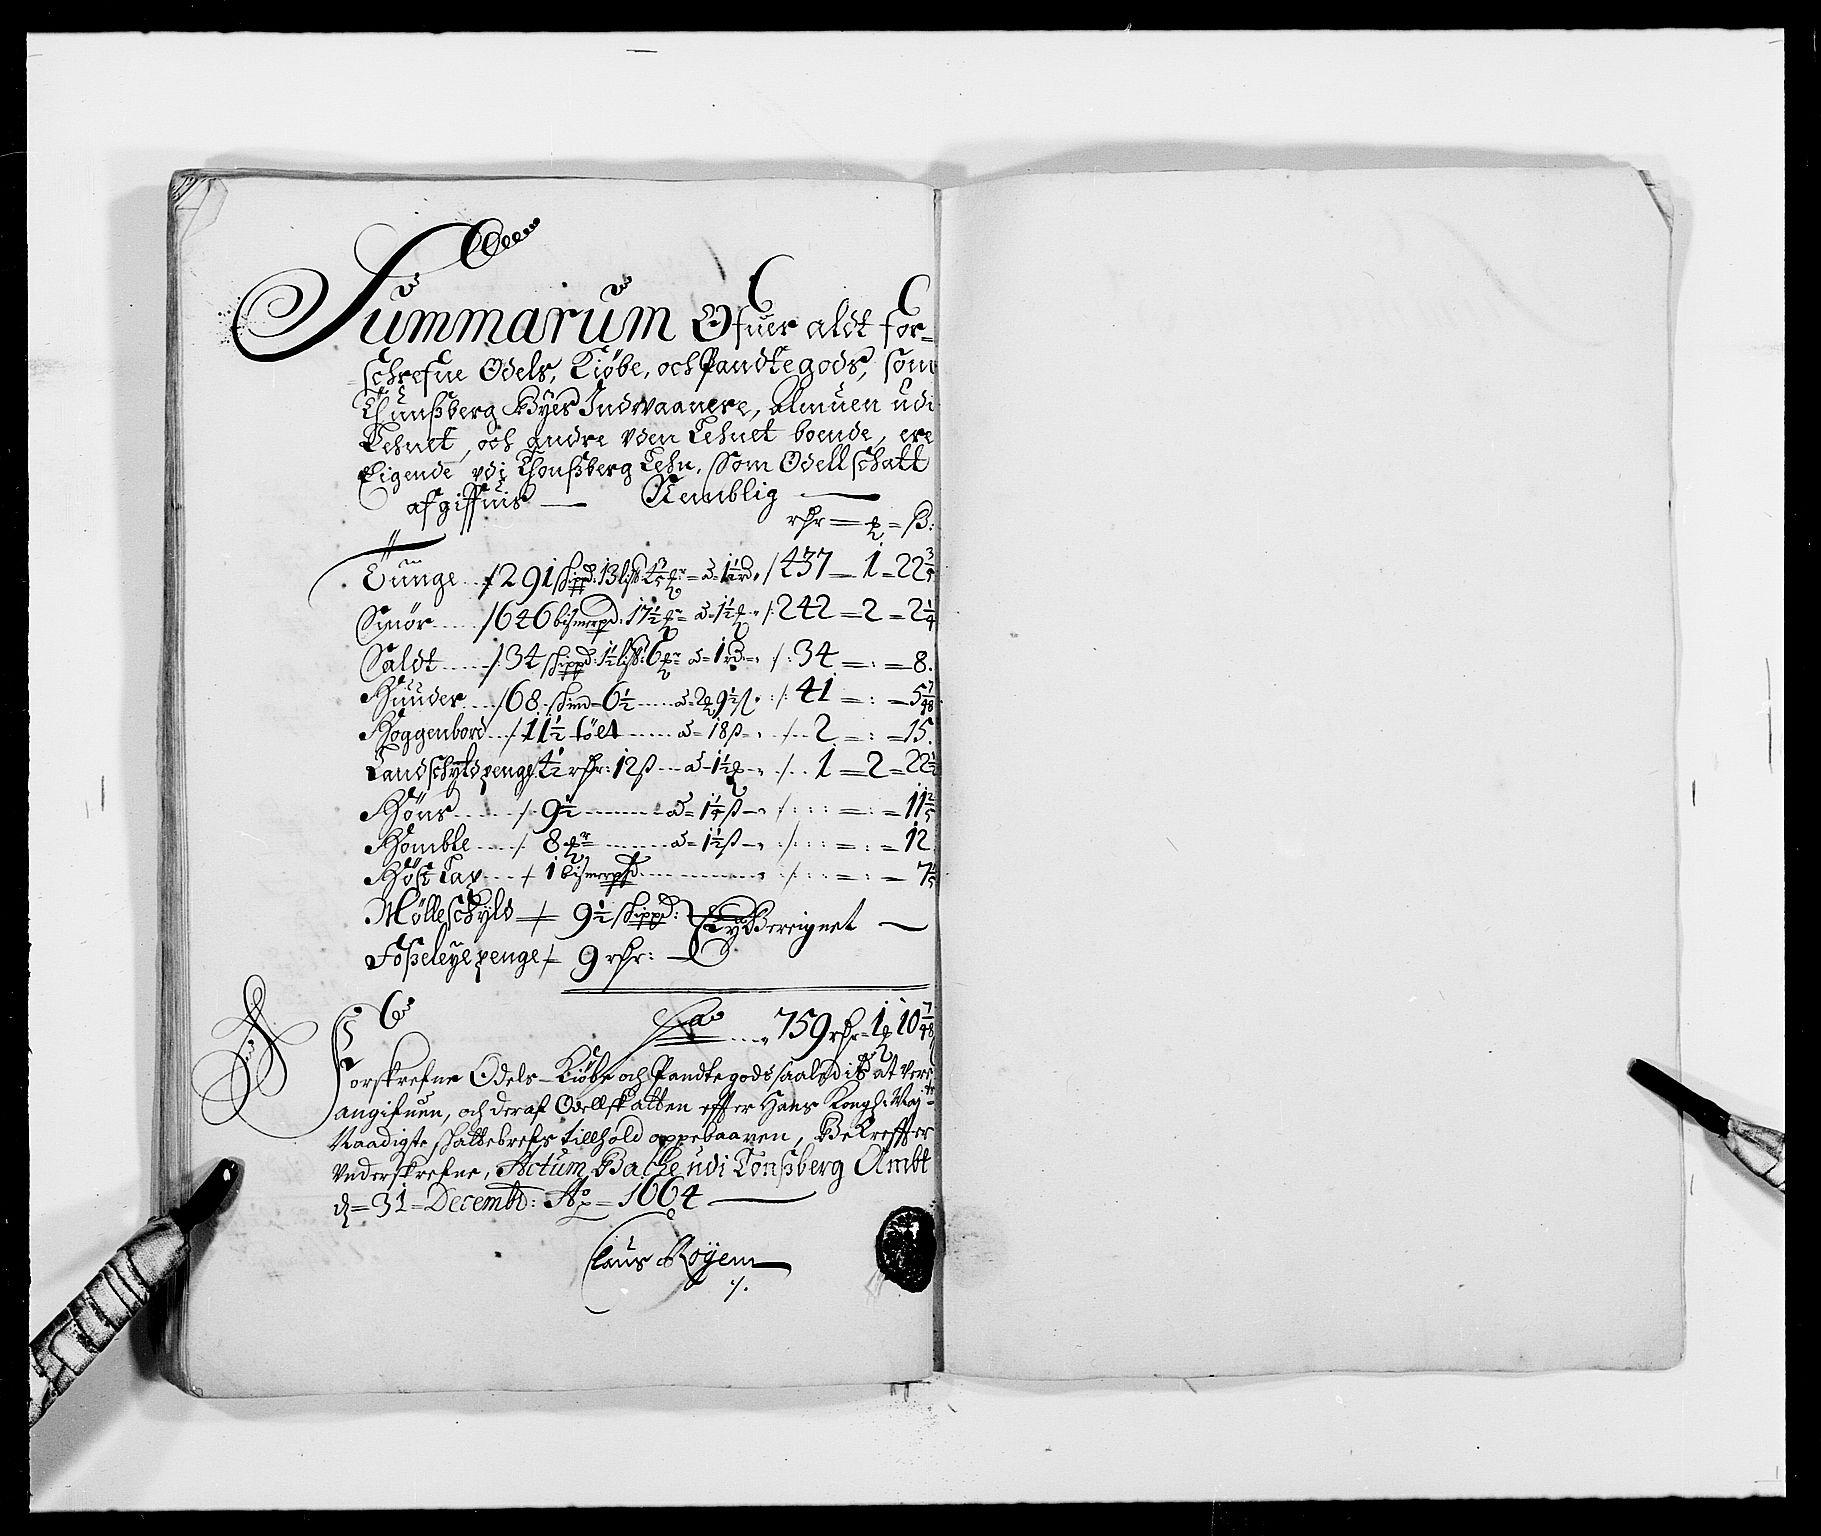 RA, Rentekammeret inntil 1814, Reviderte regnskaper, Fogderegnskap, R32/L1839: Fogderegnskap Jarlsberg grevskap, 1664-1673, s. 284